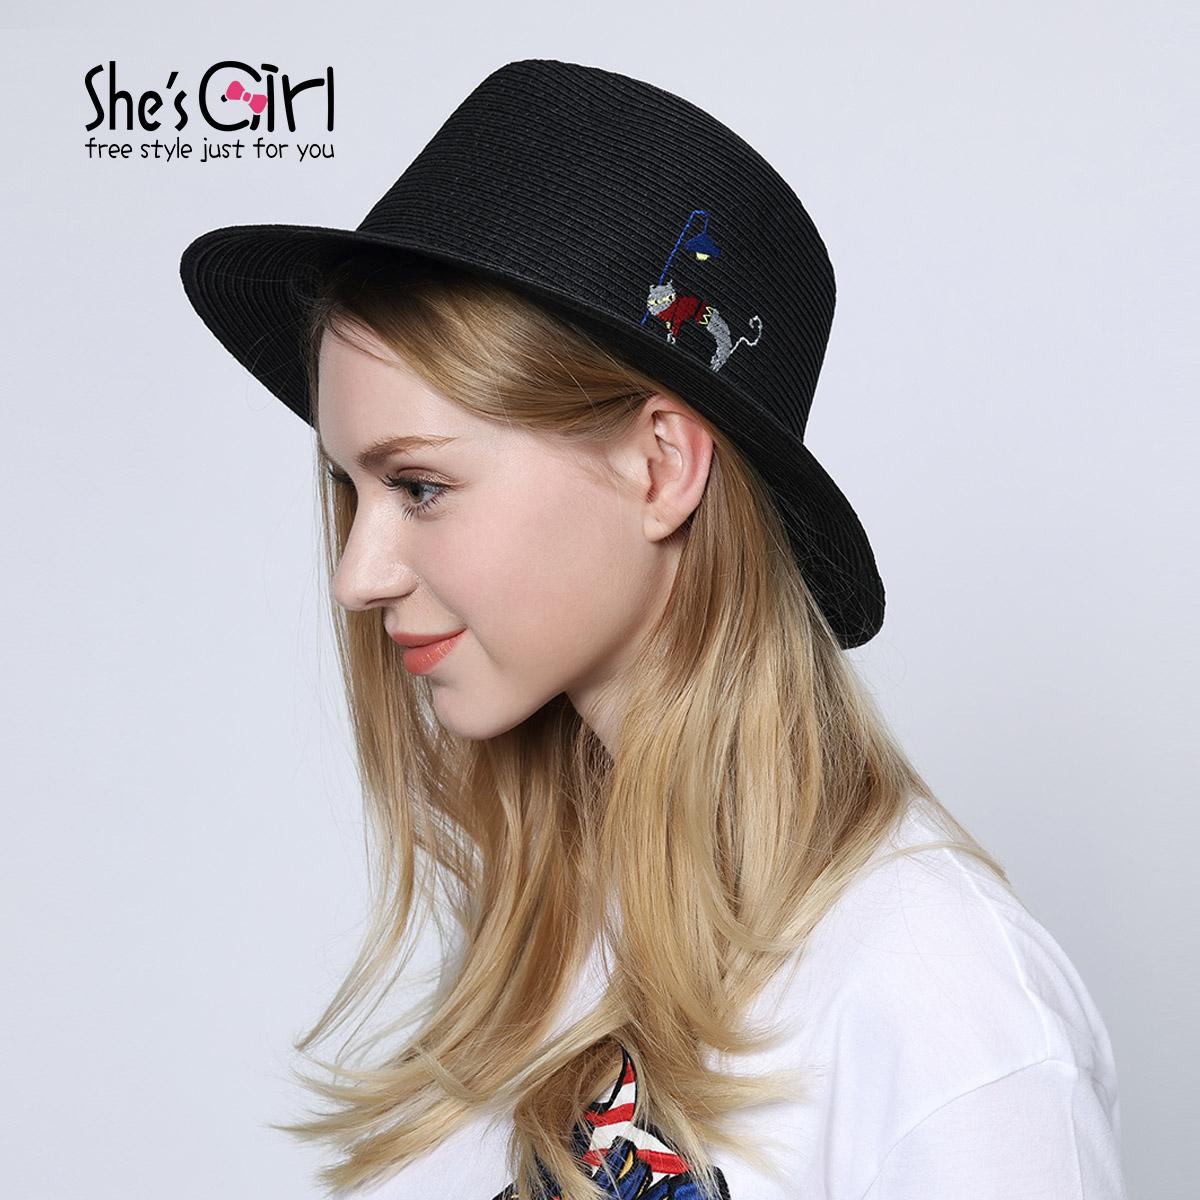 Shesgirl茜子配饰 猫星人系列时尚户外圆边休闲渔夫帽子遮阳帽